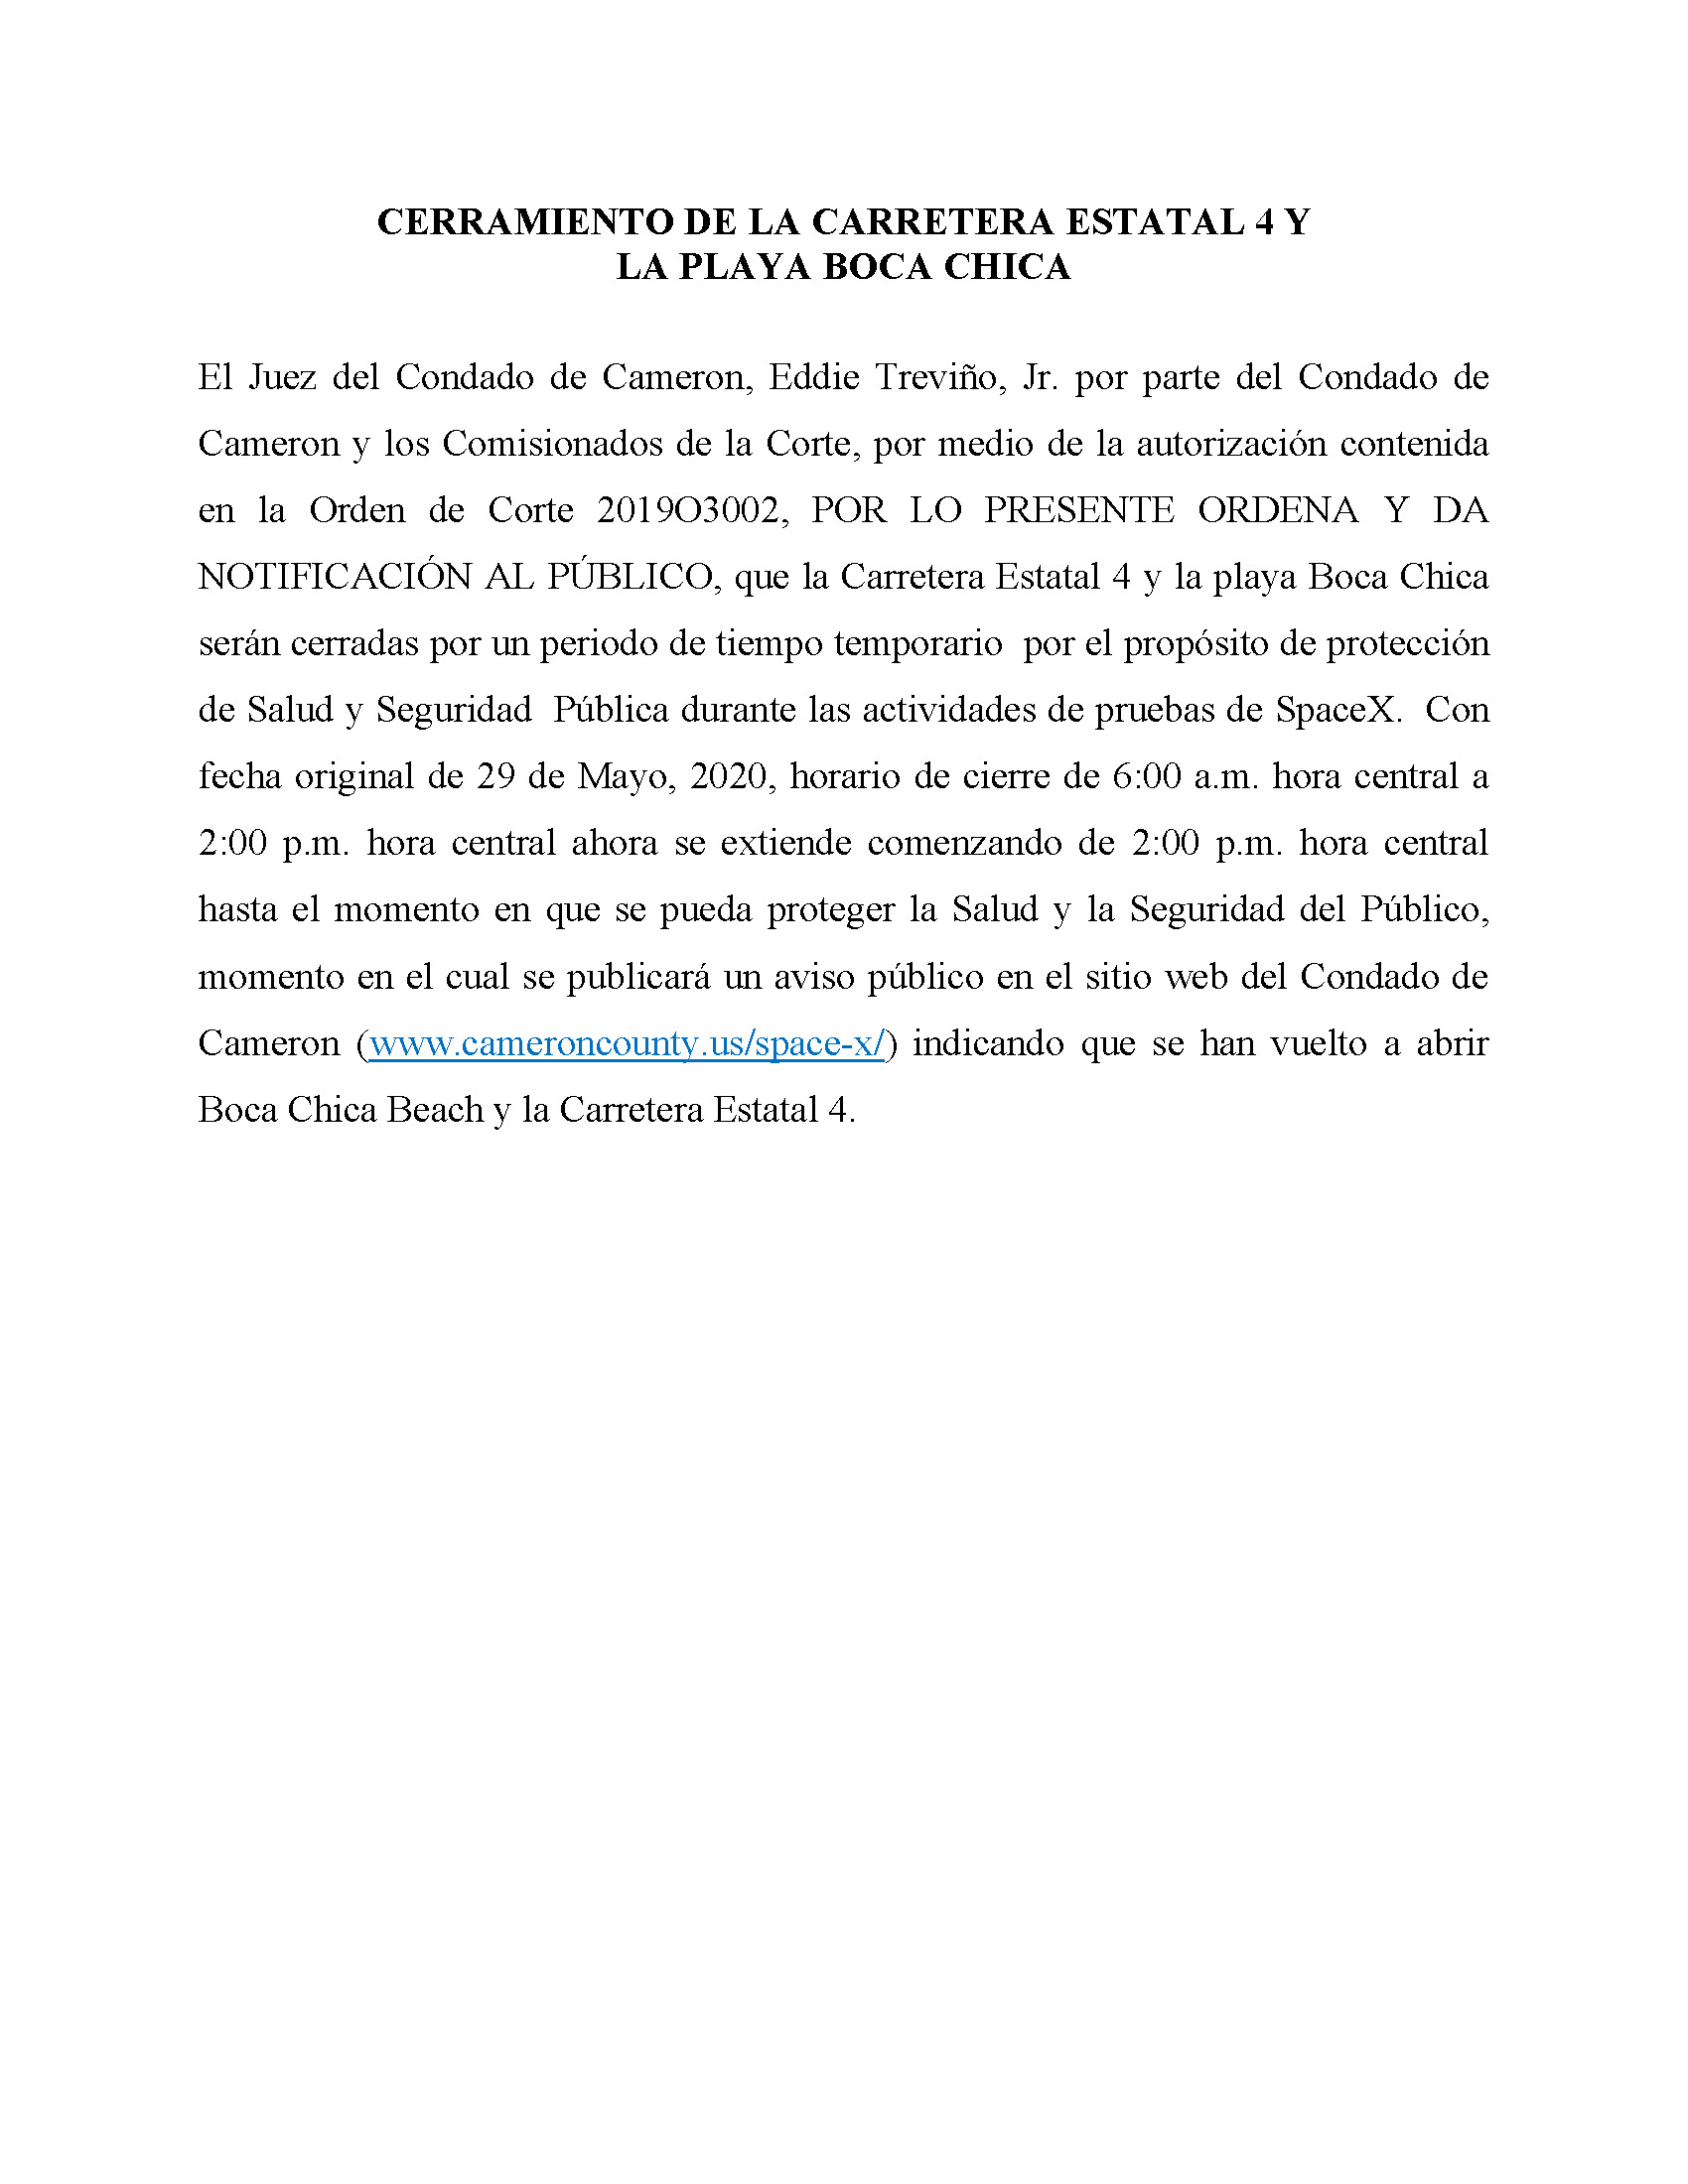 ORDER.CLOSURE OF HIGHWAY 4 Y LA PLAYA BOCA CHICA.SPANISH.05.29.20